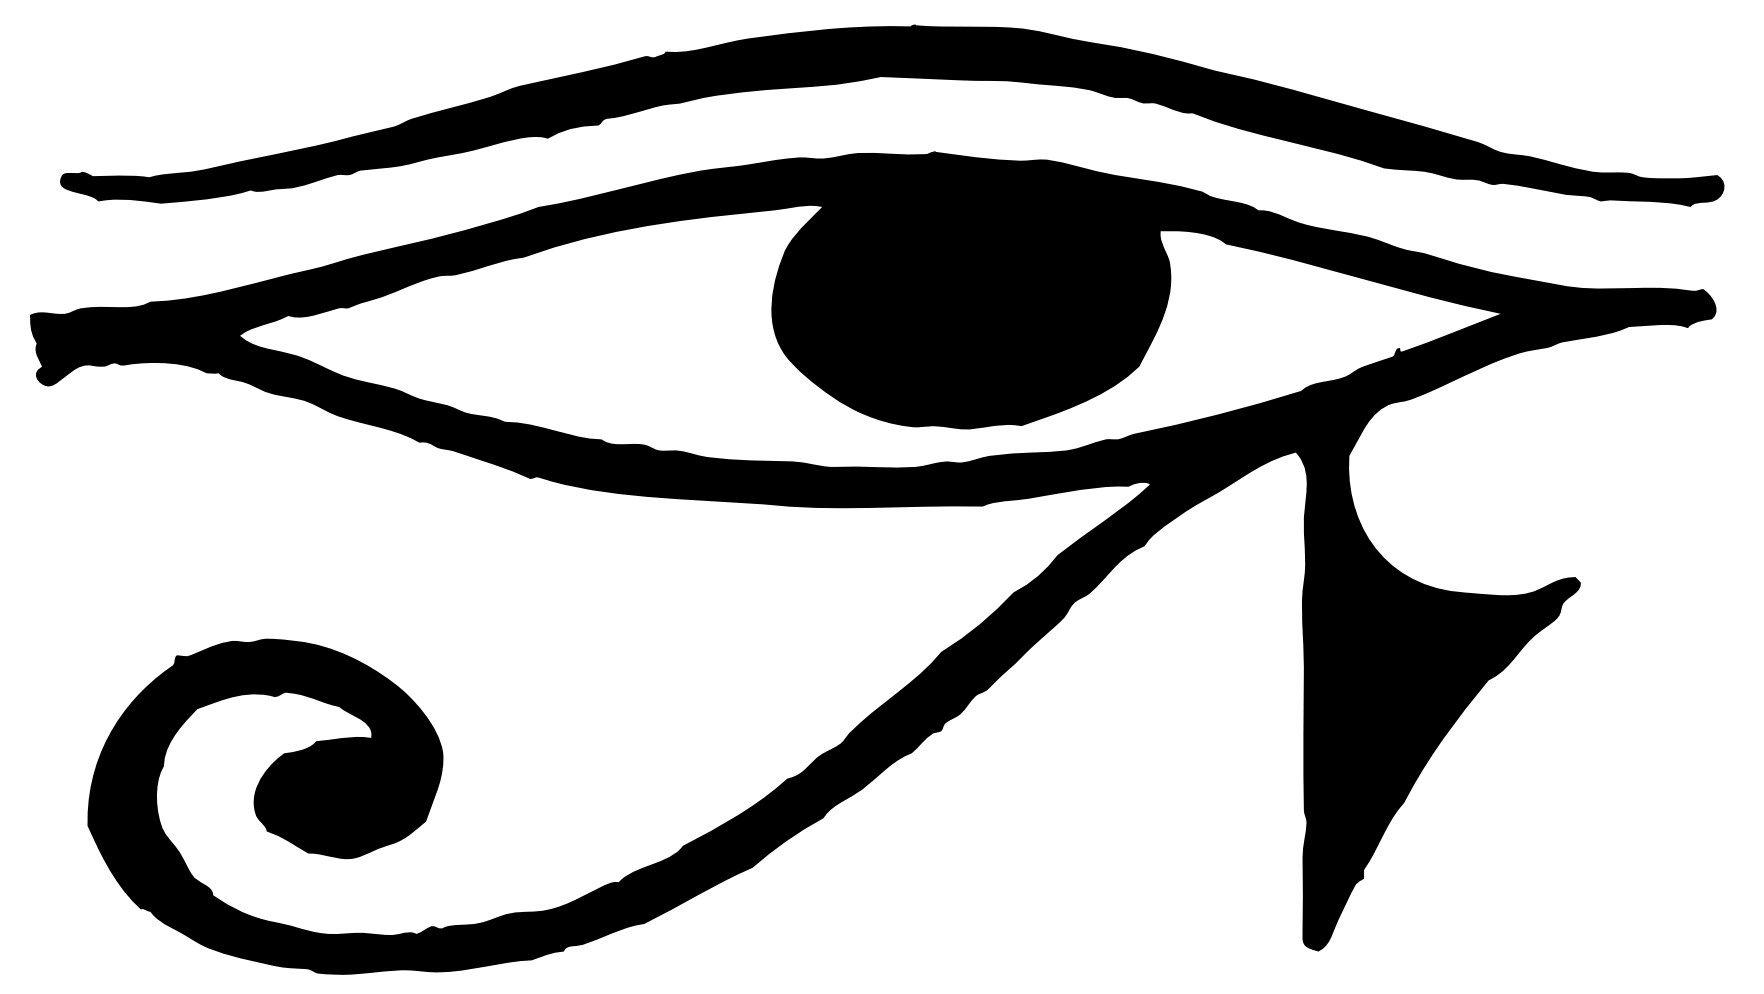 1764x994 High Resolution Wallpapers Widescreen Eye Of Horus History Girl Egyptian Eye Symbol Health Symbol